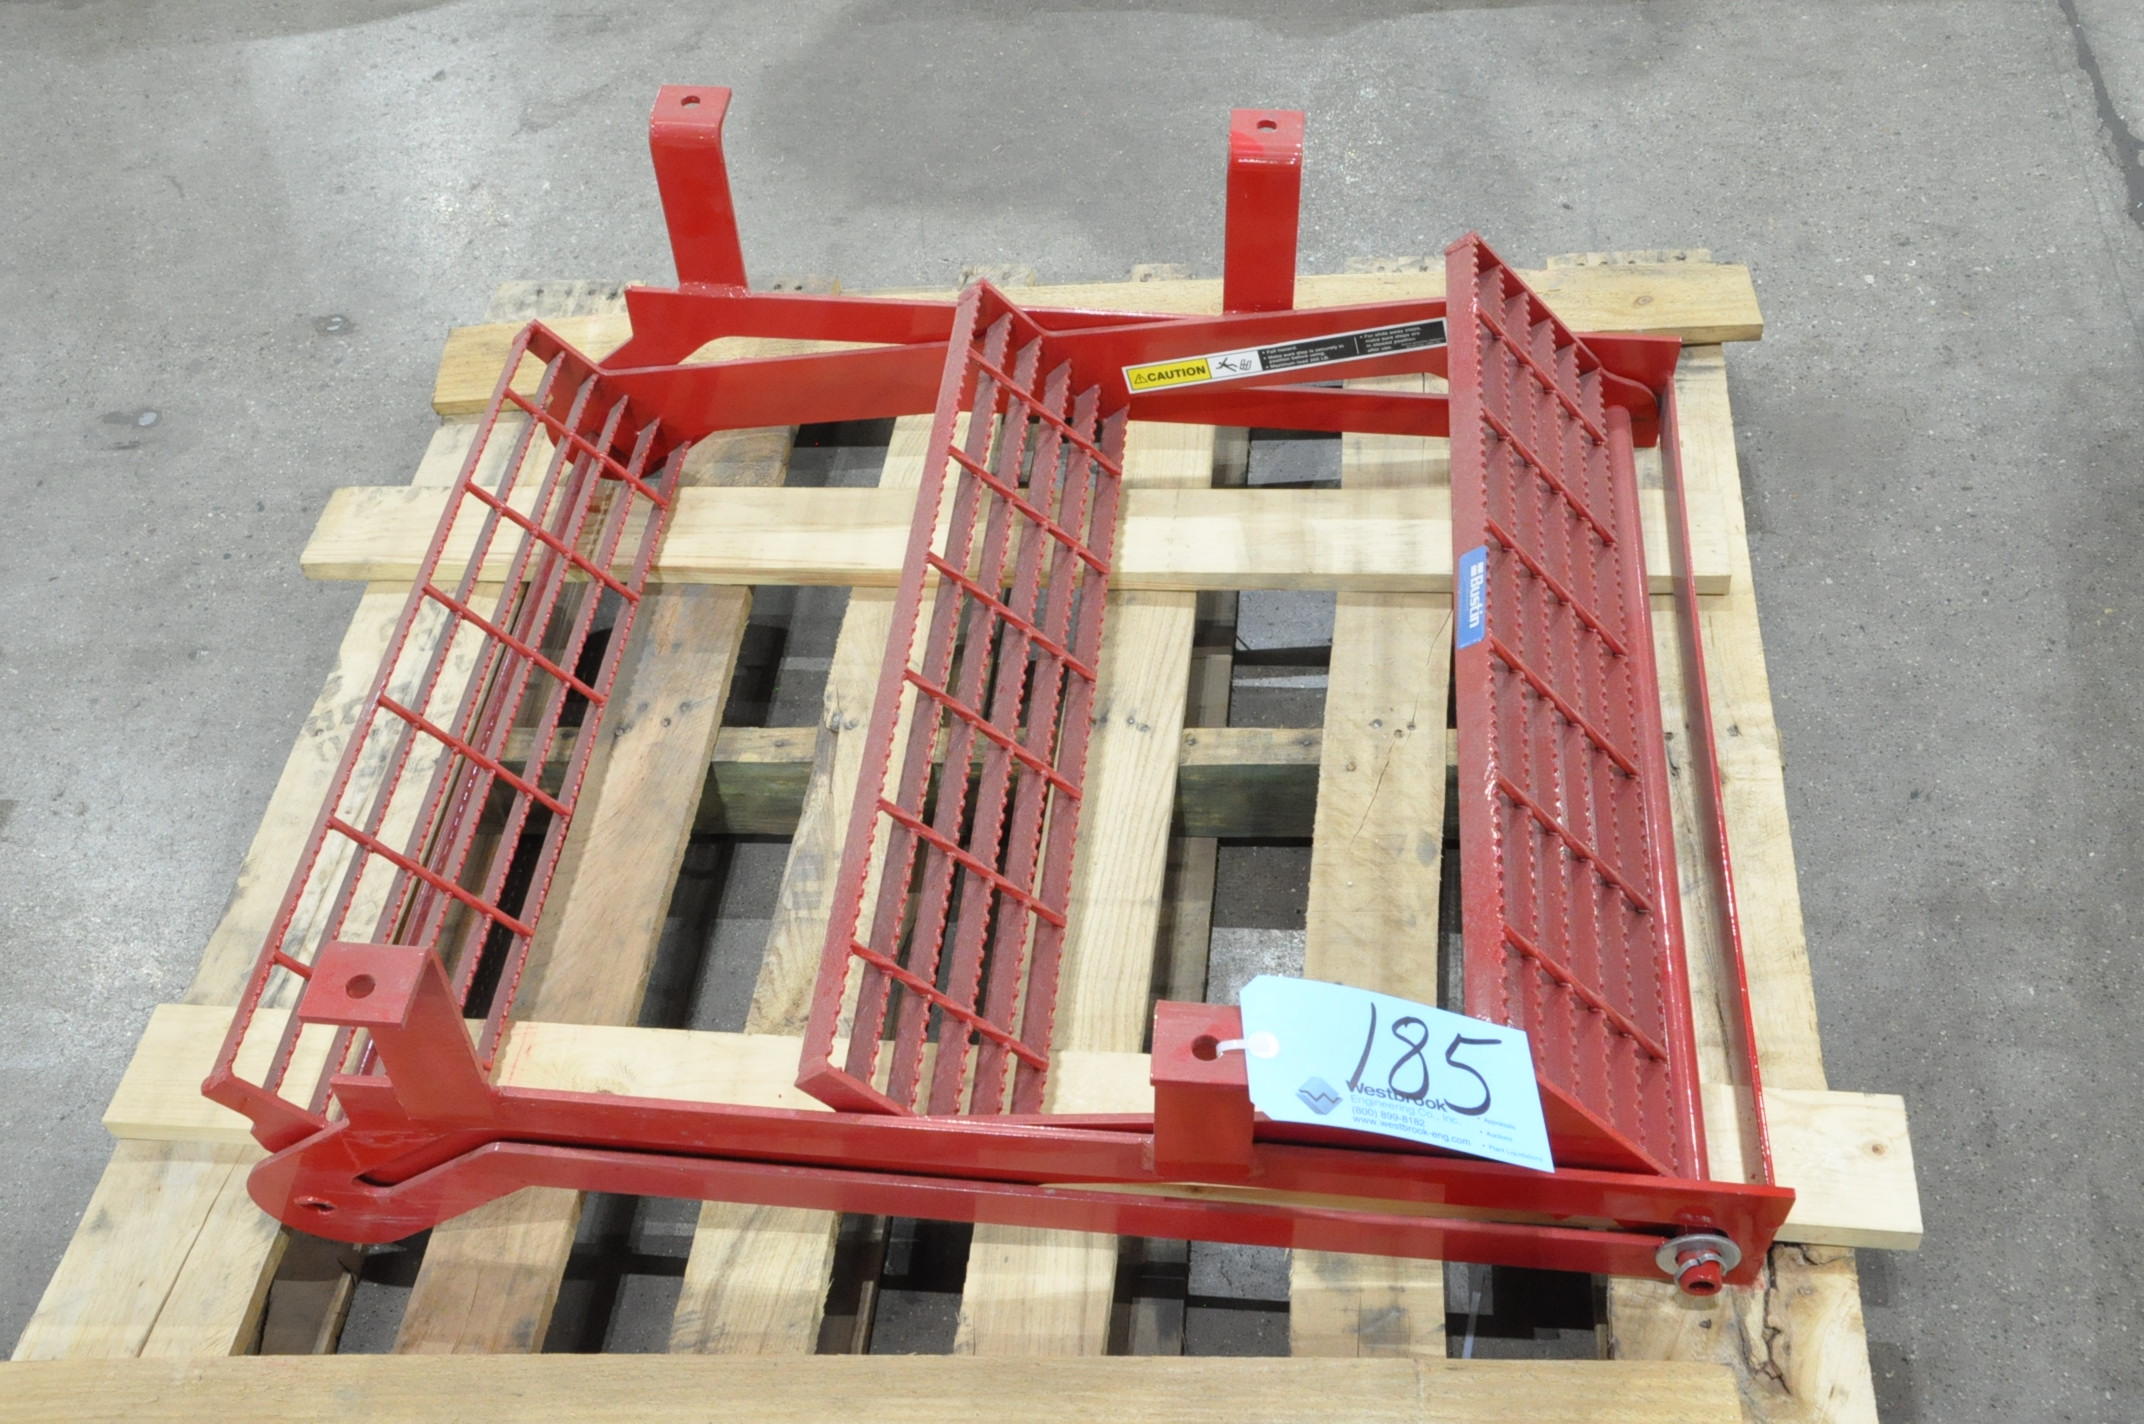 Lot-Bustin Step Units on (1) Pallet